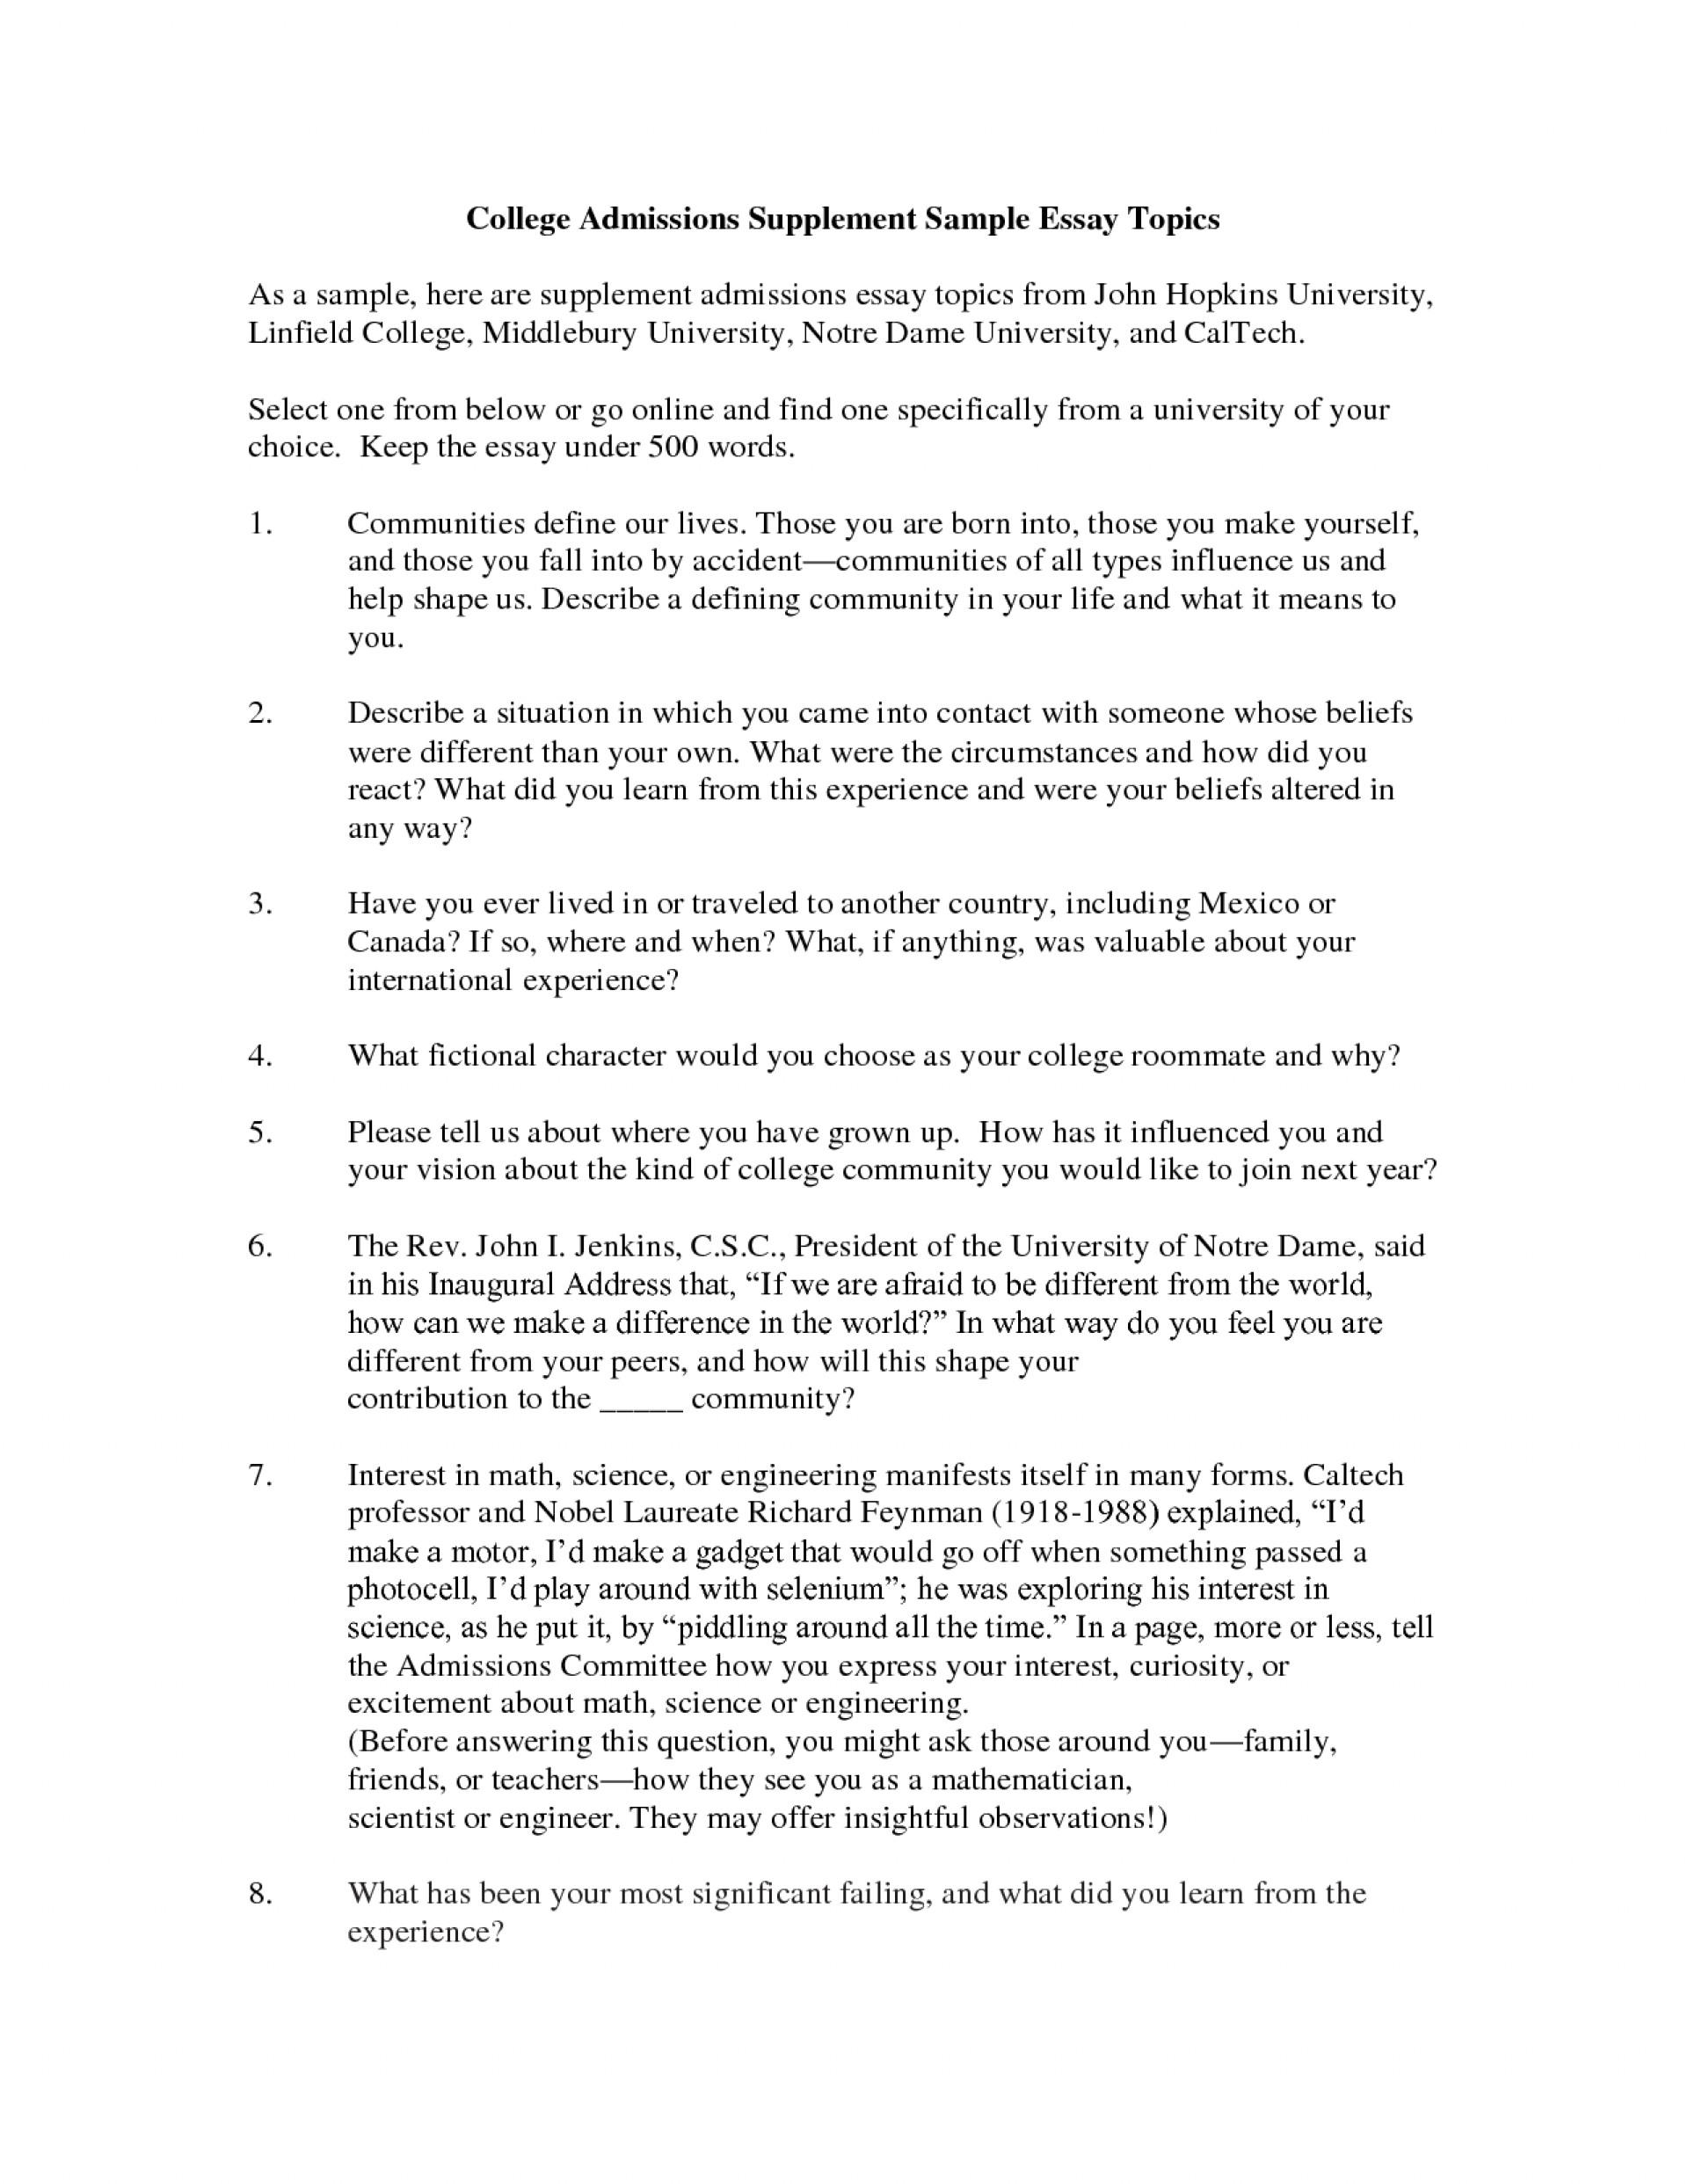 011 Apply Texas Essays Fall Unusual College Essay Prompts Term Paper Academic Service Admission Application Topics 4 Uc App Ucf Admissions Impressive 2015 1920